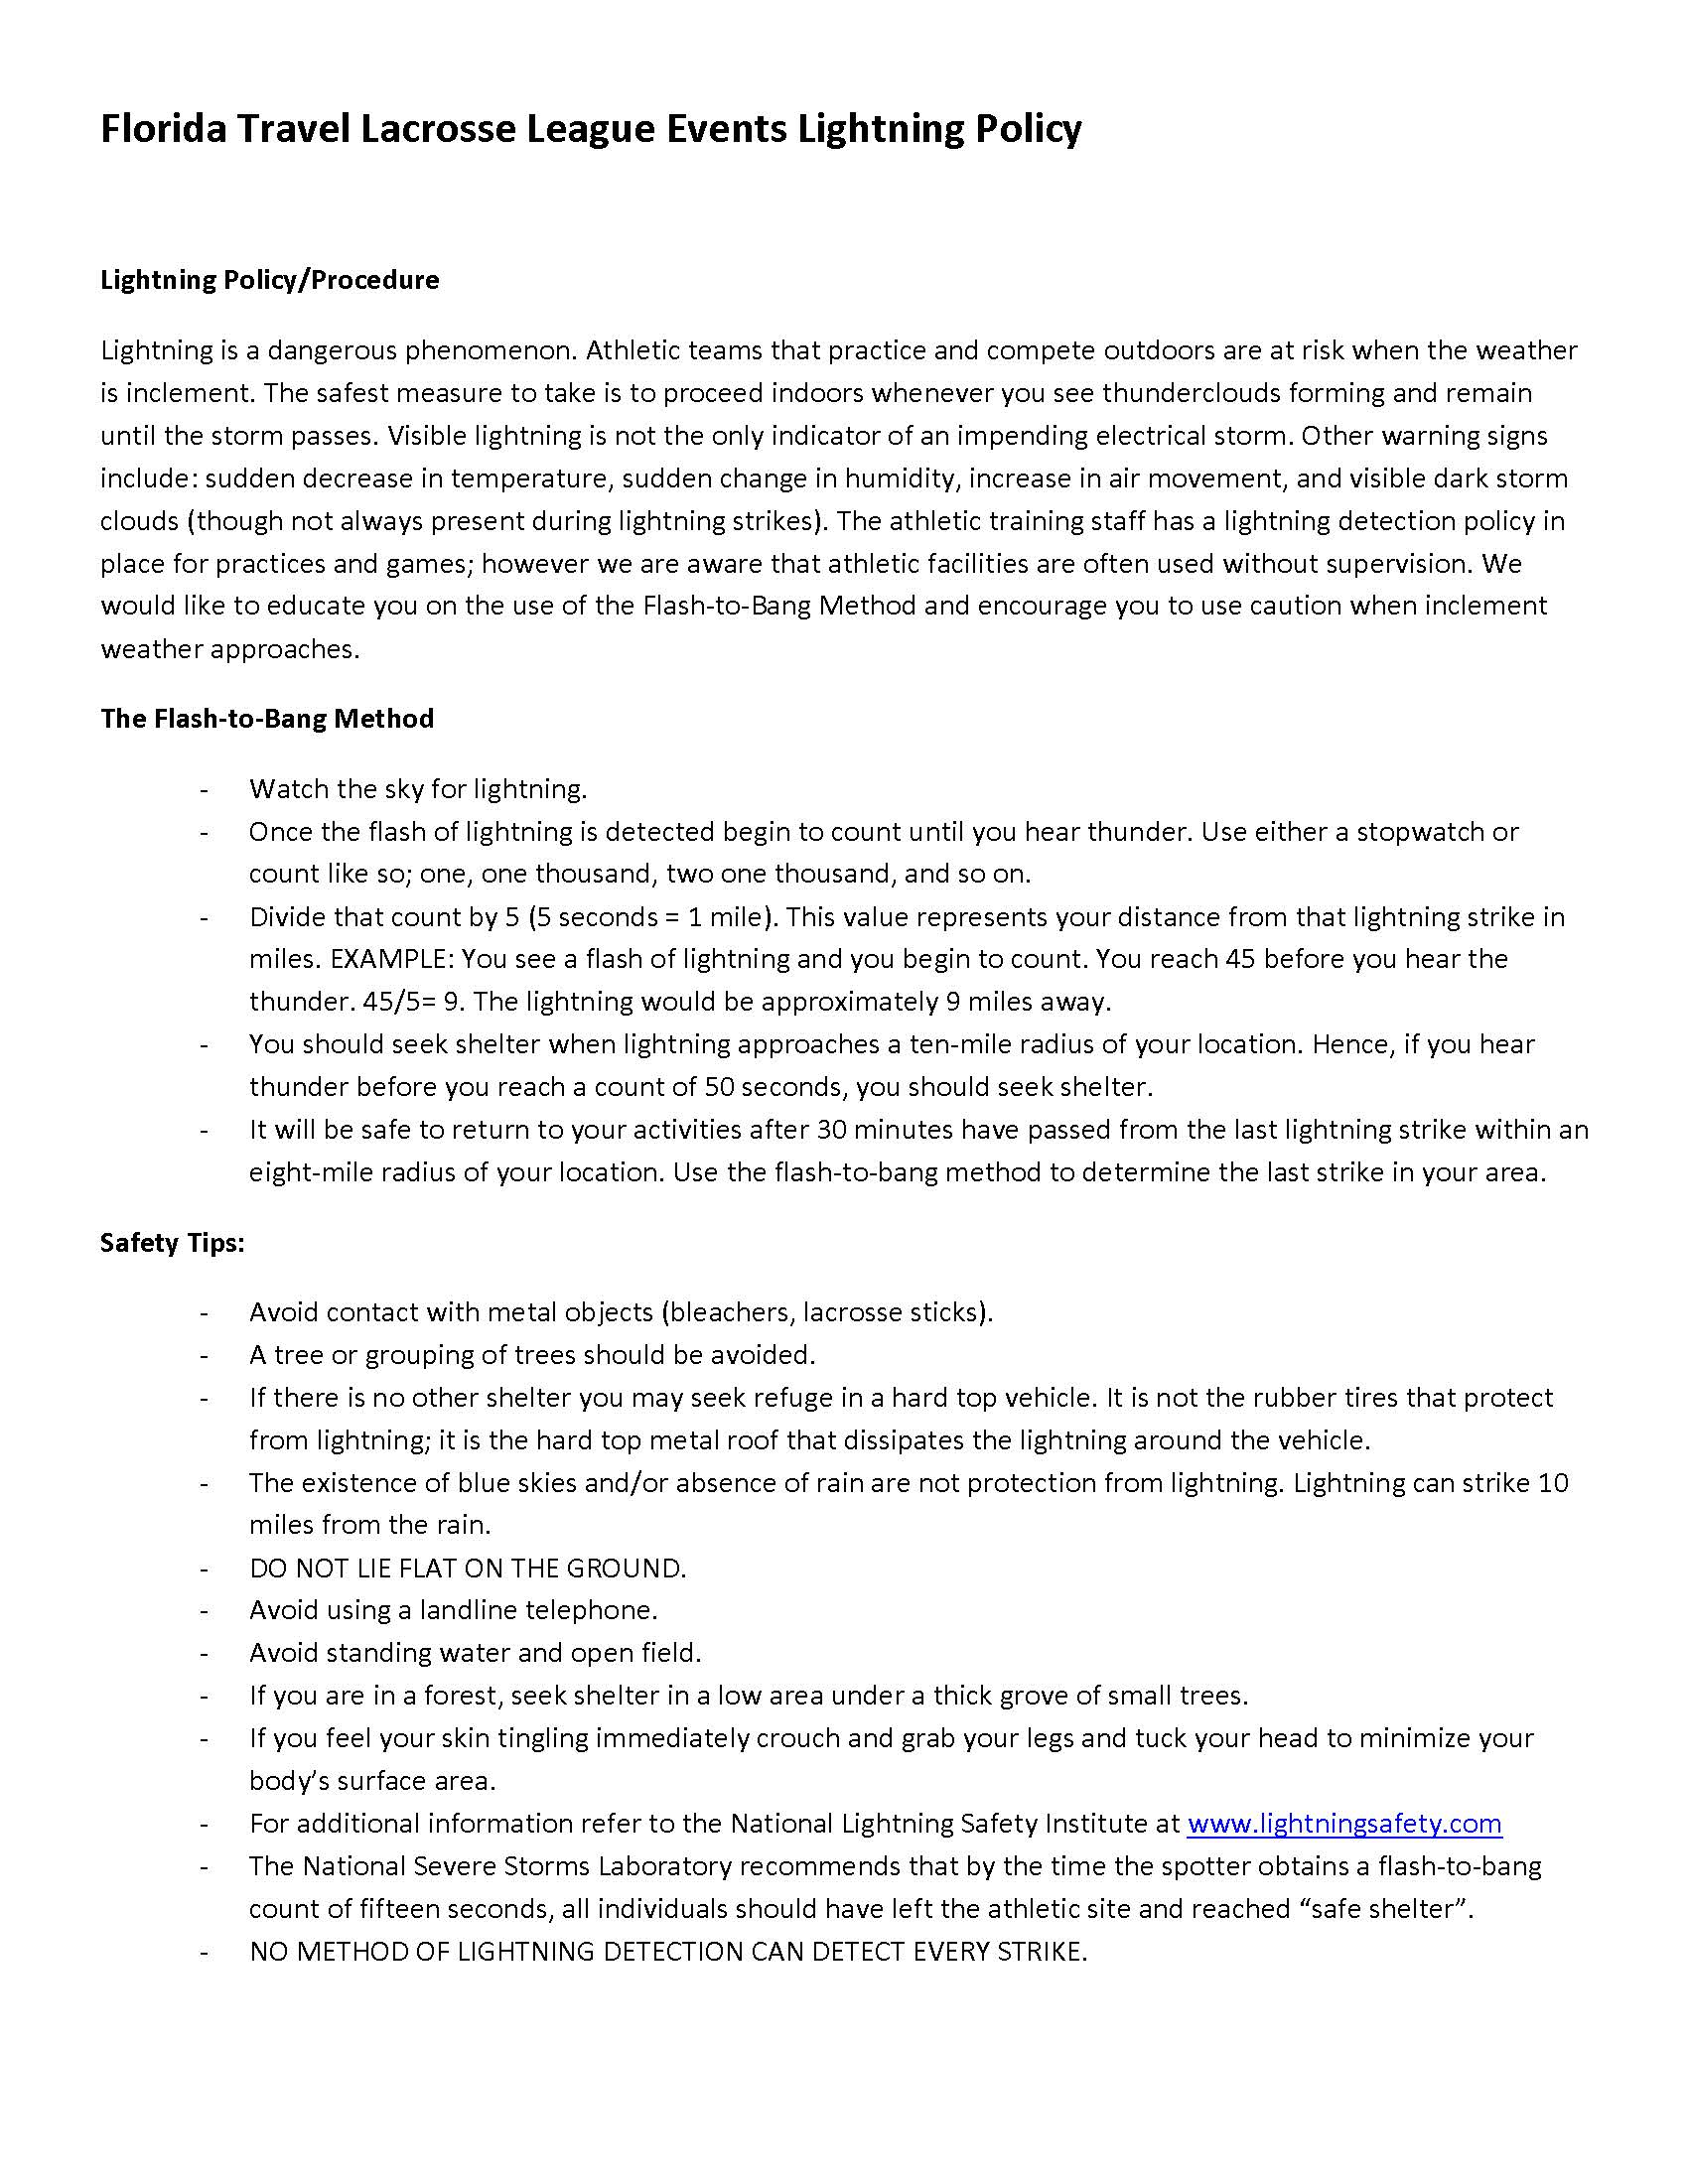 FTLL LIGHTENING POLICY PDF_Page_1